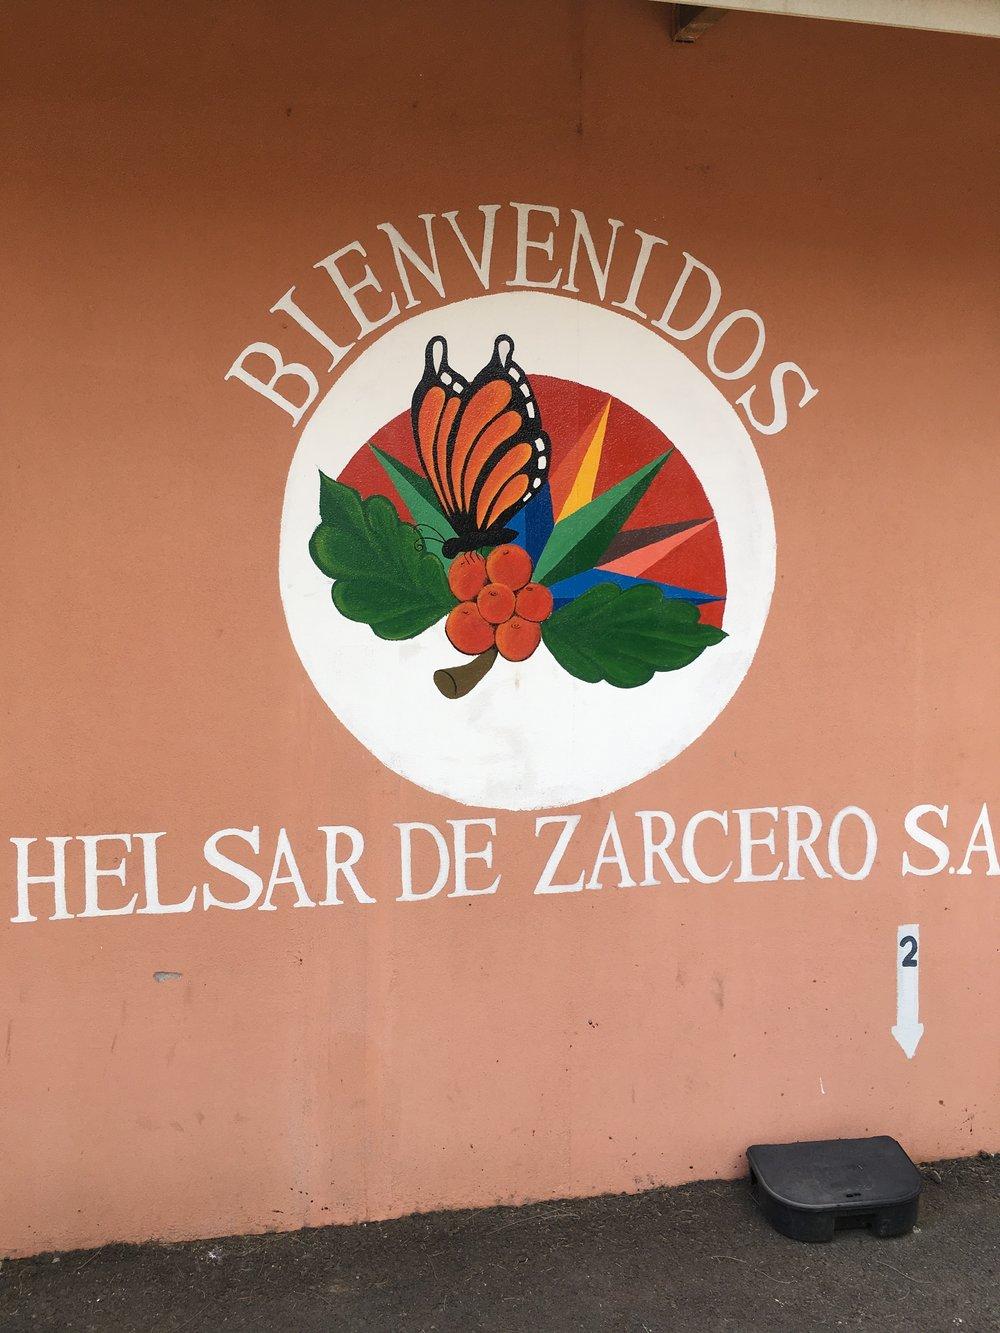 Helsar de Zarcero - Costa Rica.jpg